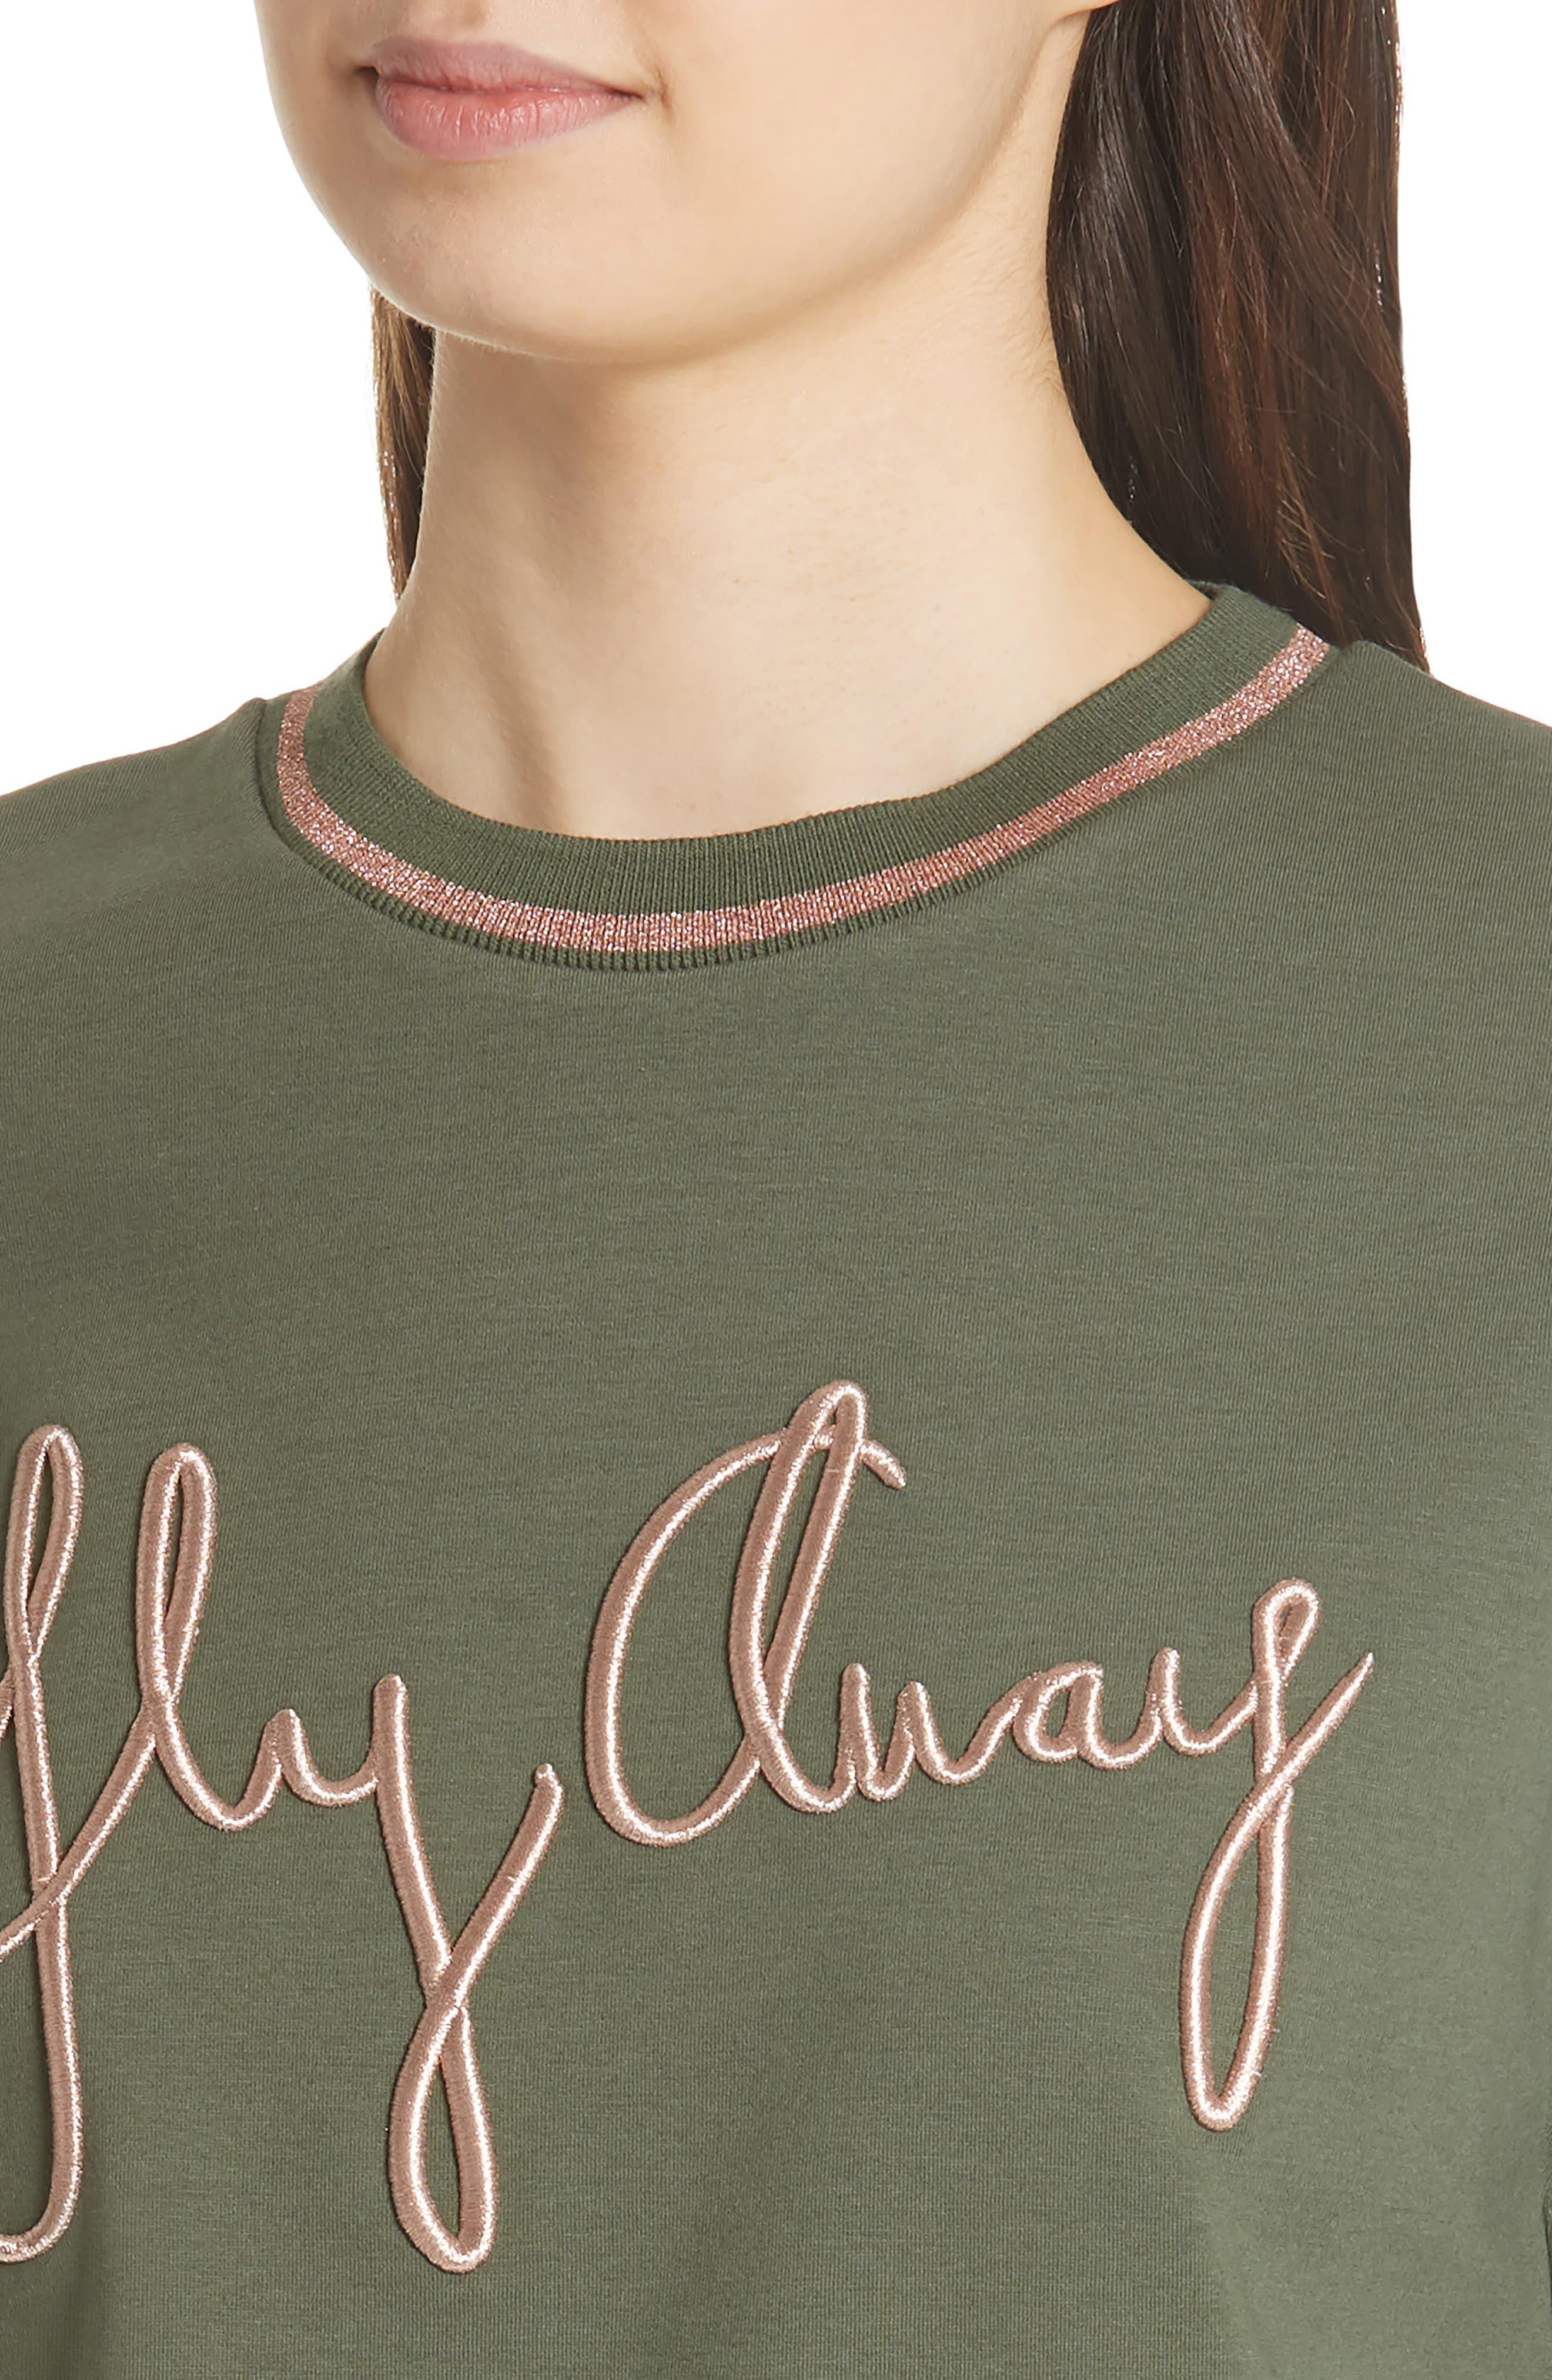 Abileen Fly Away Embroidered Sweatshirt,                             Alternate thumbnail 4, color,                             Khaki